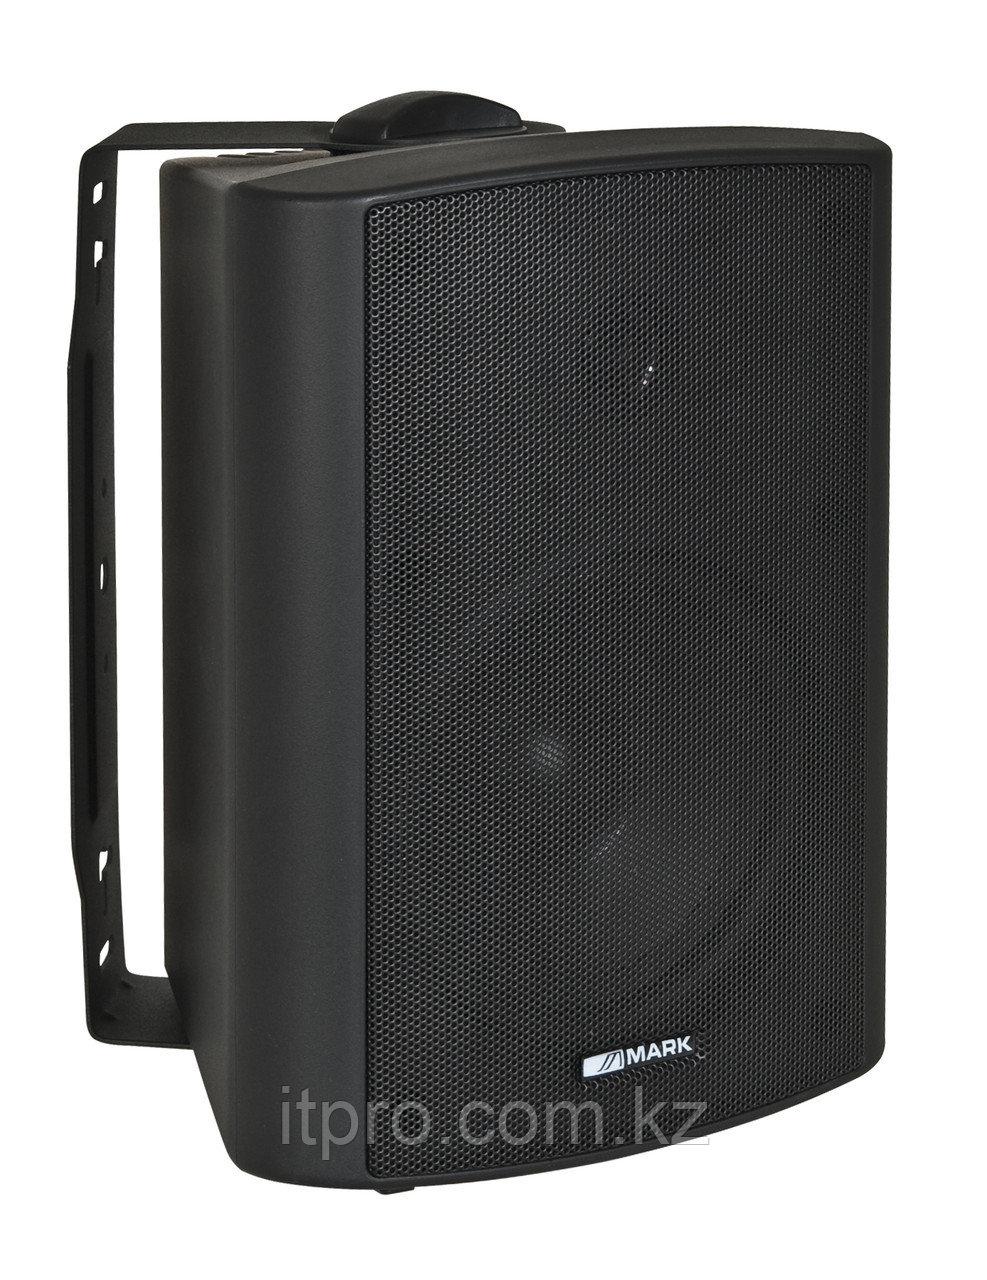 Комплект настенных громкоговорителей MARK MONITOR 3T BLACK (Цена за 2 шт.)